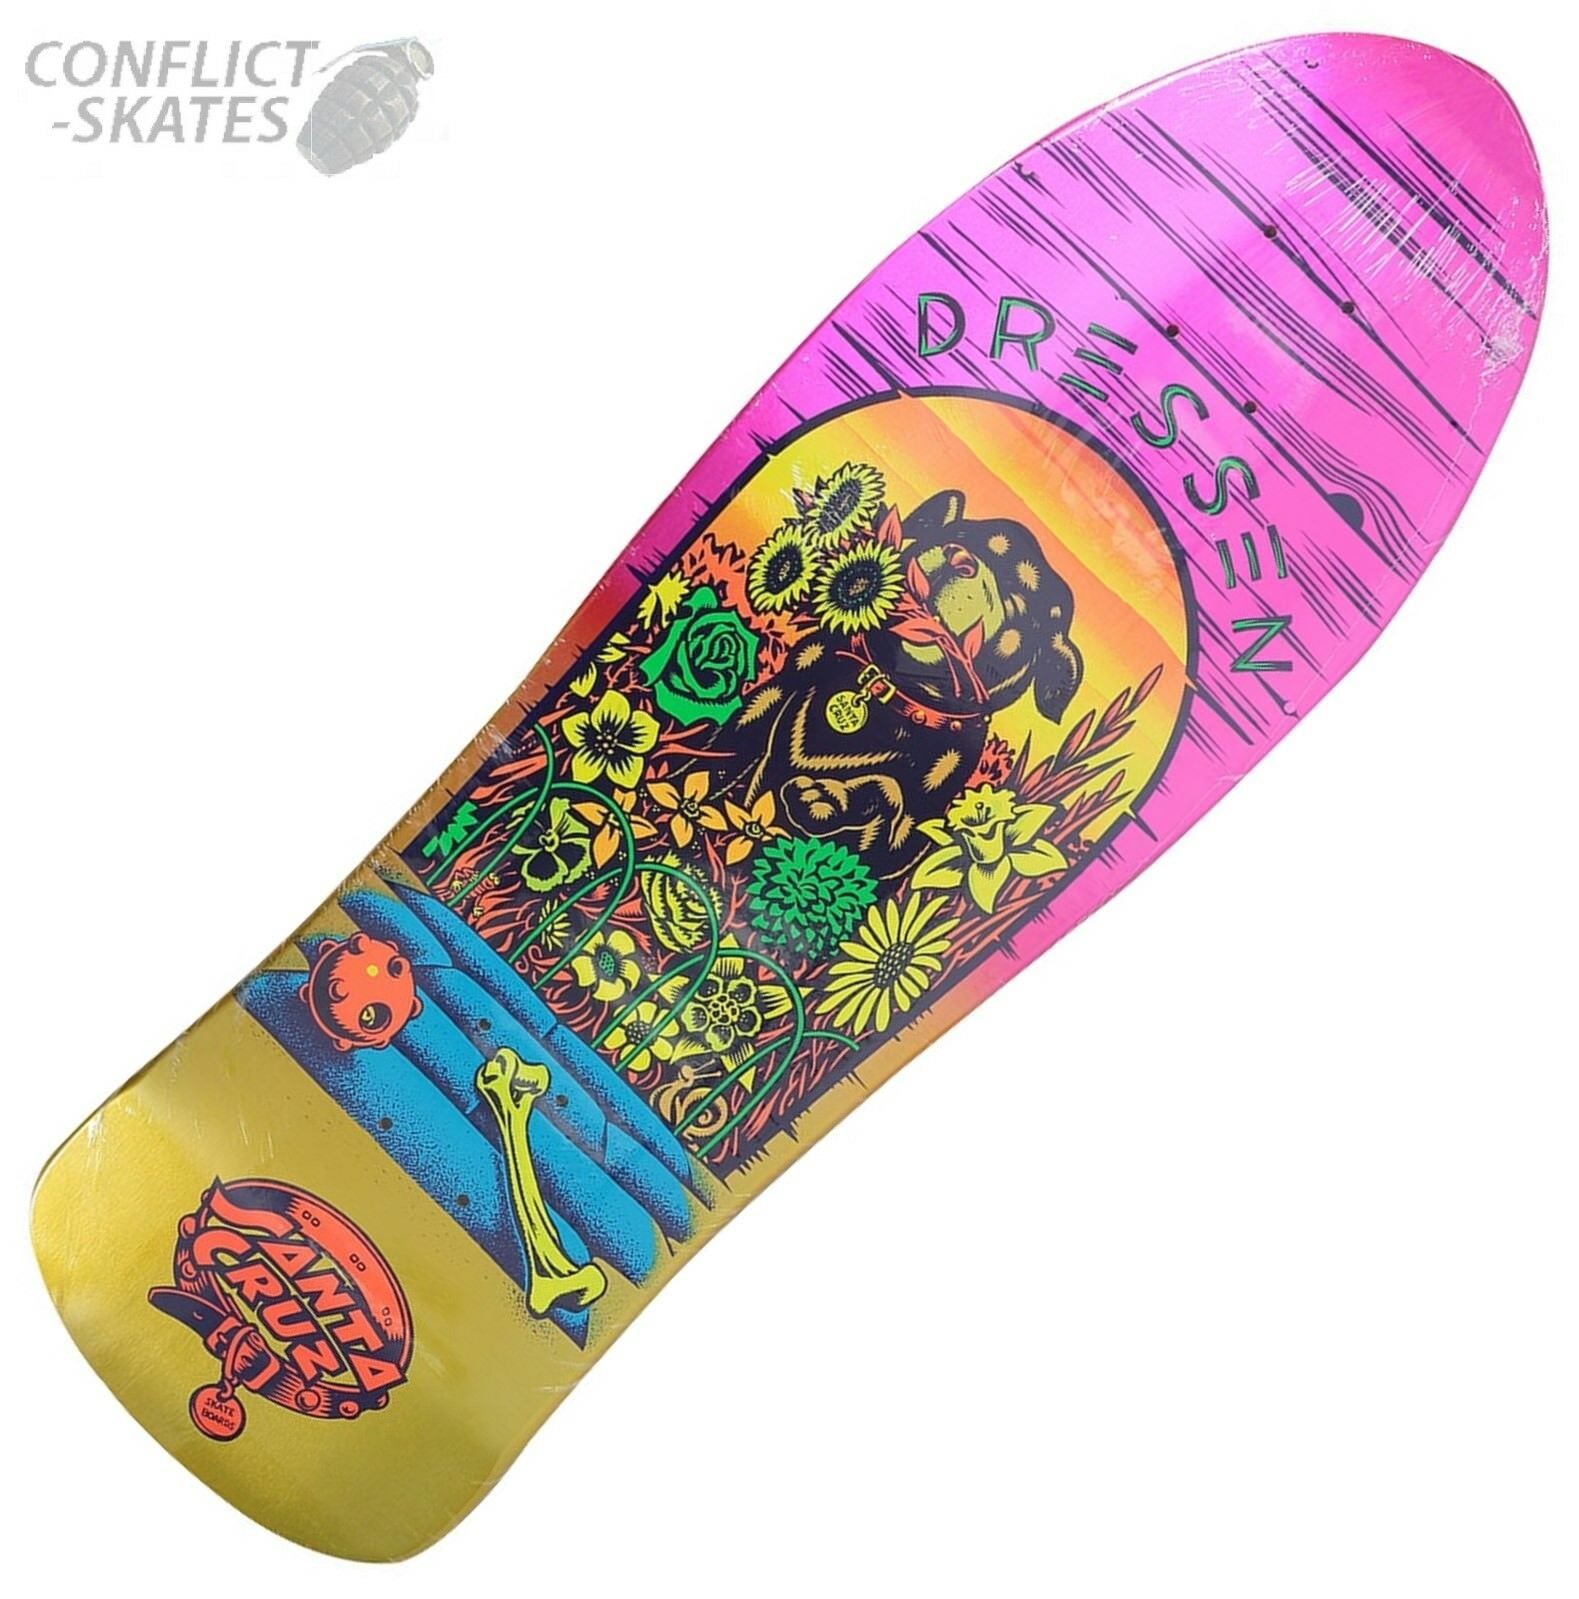 "SEA BRAWL REISSUE 9.35/"" Santa Cruz Skateboard Deck"